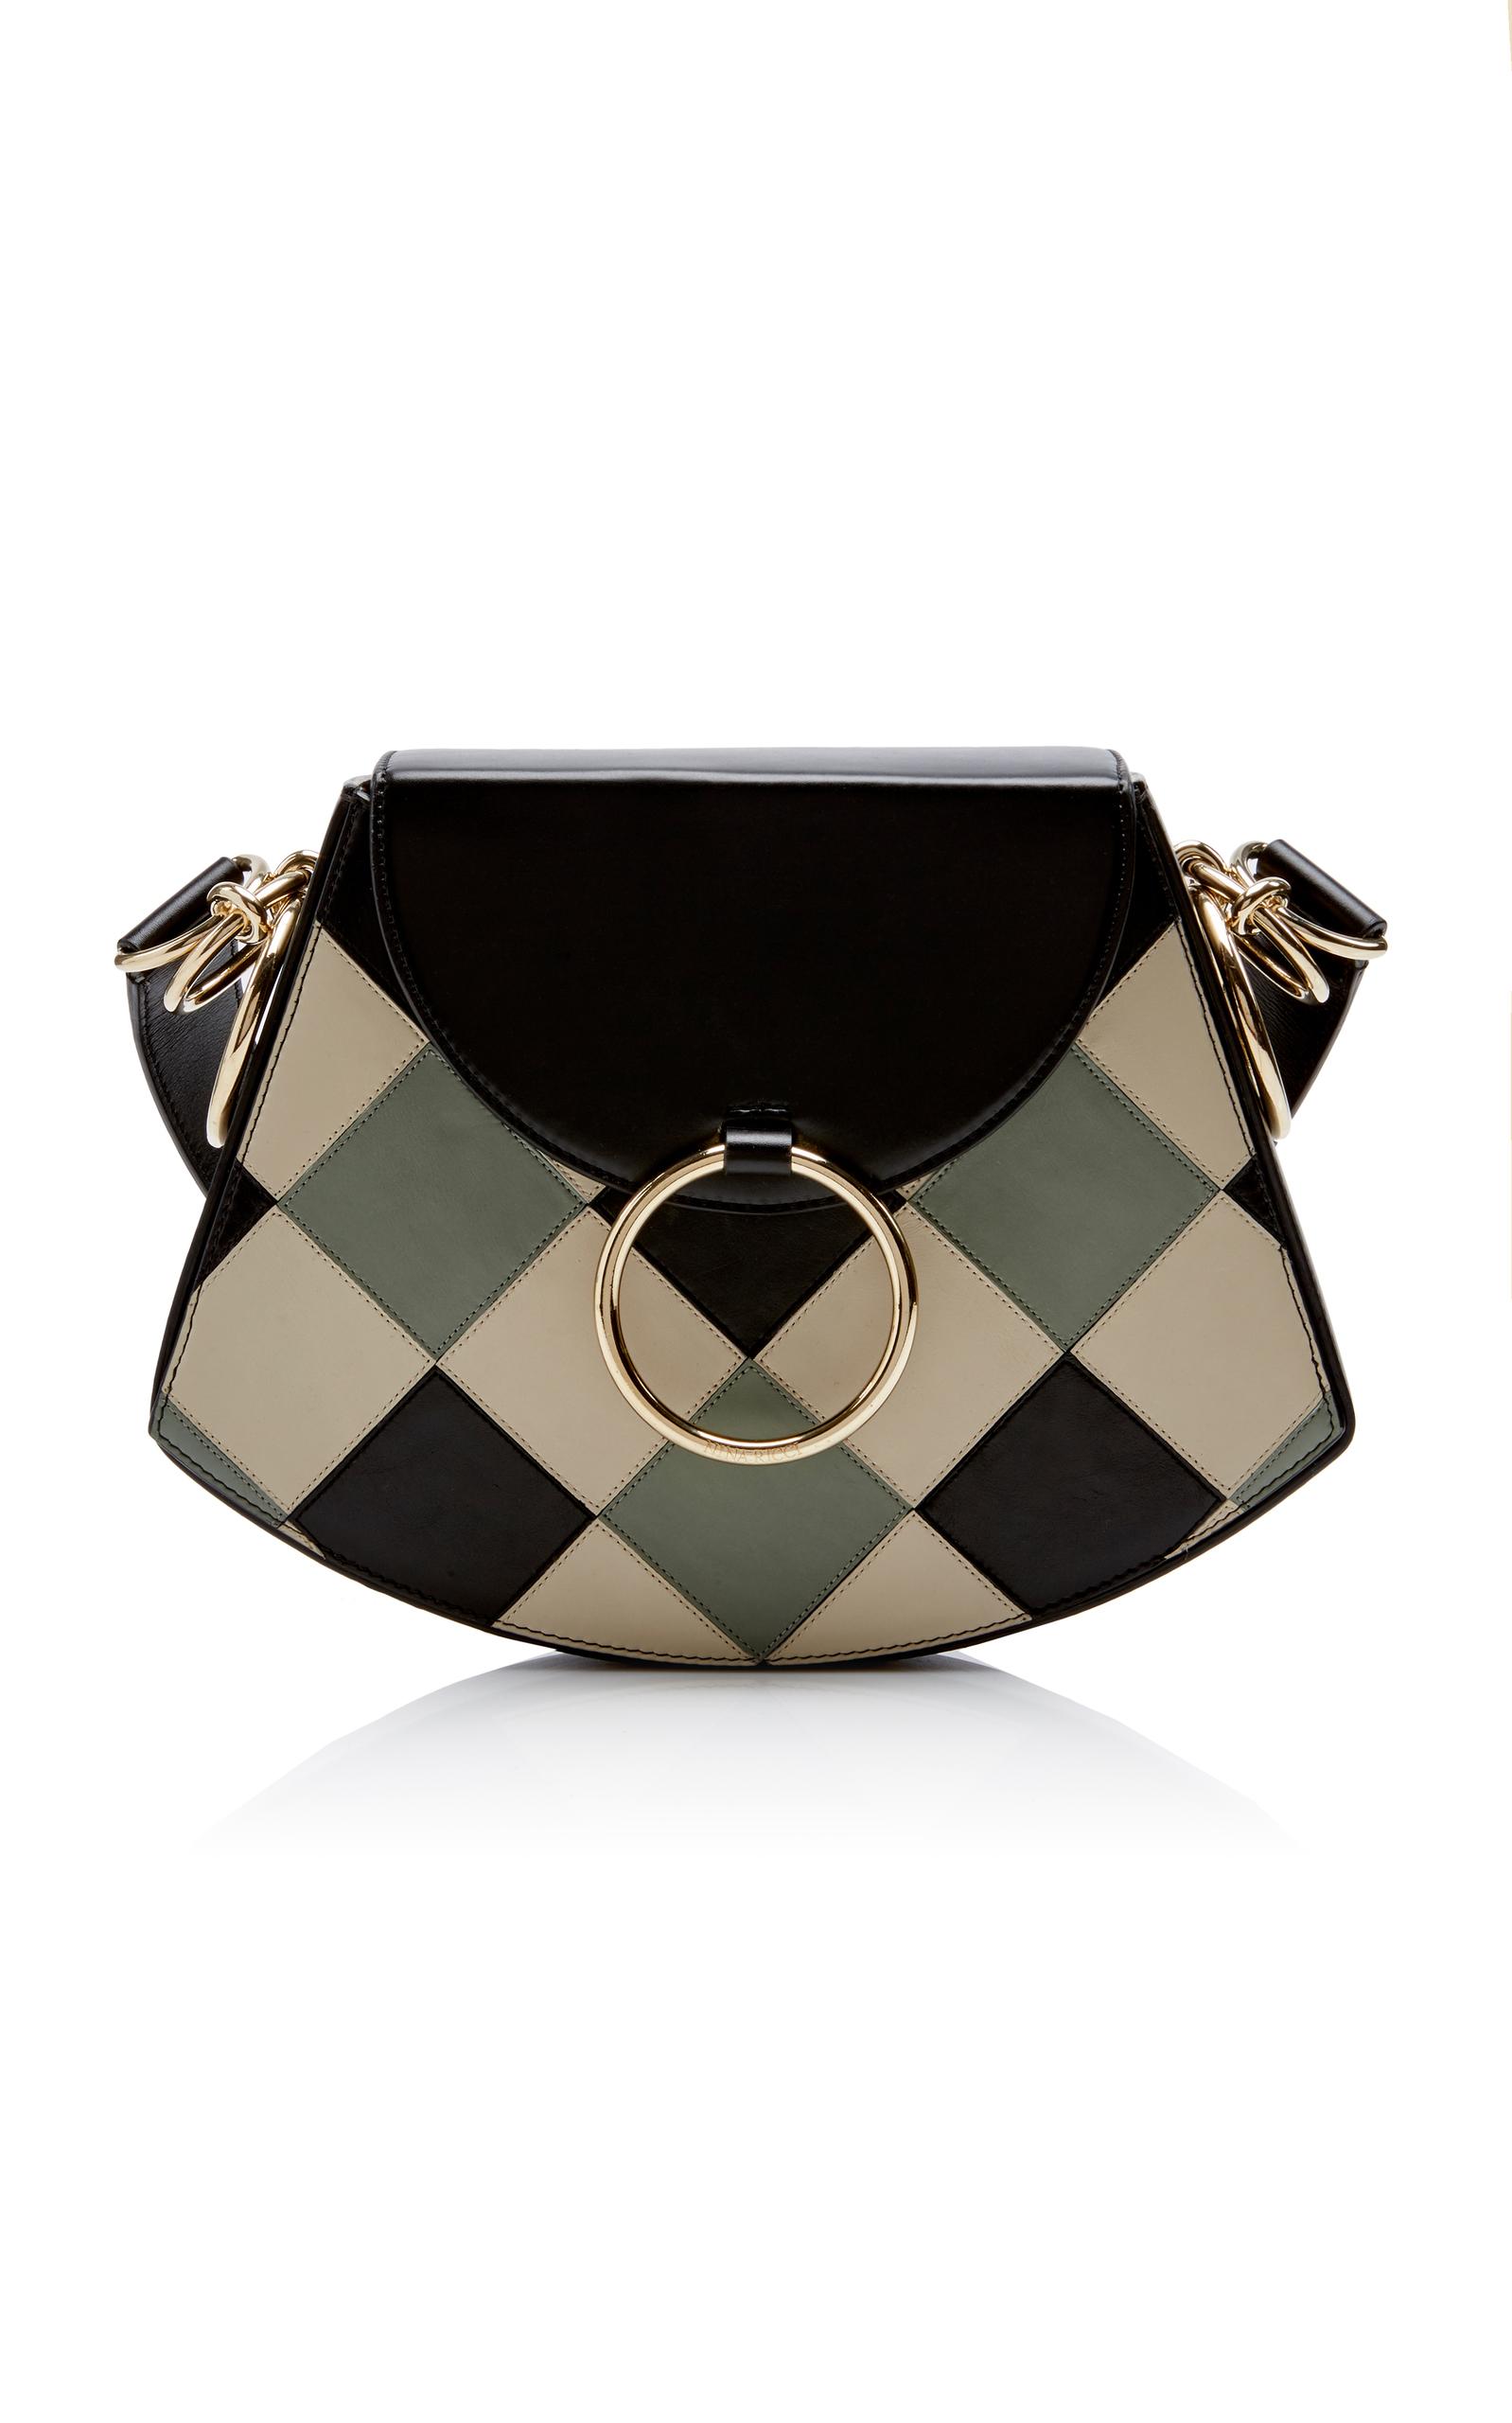 ebbfd55067 Nina RicciLarge Circus Bag. CLOSE. Loading